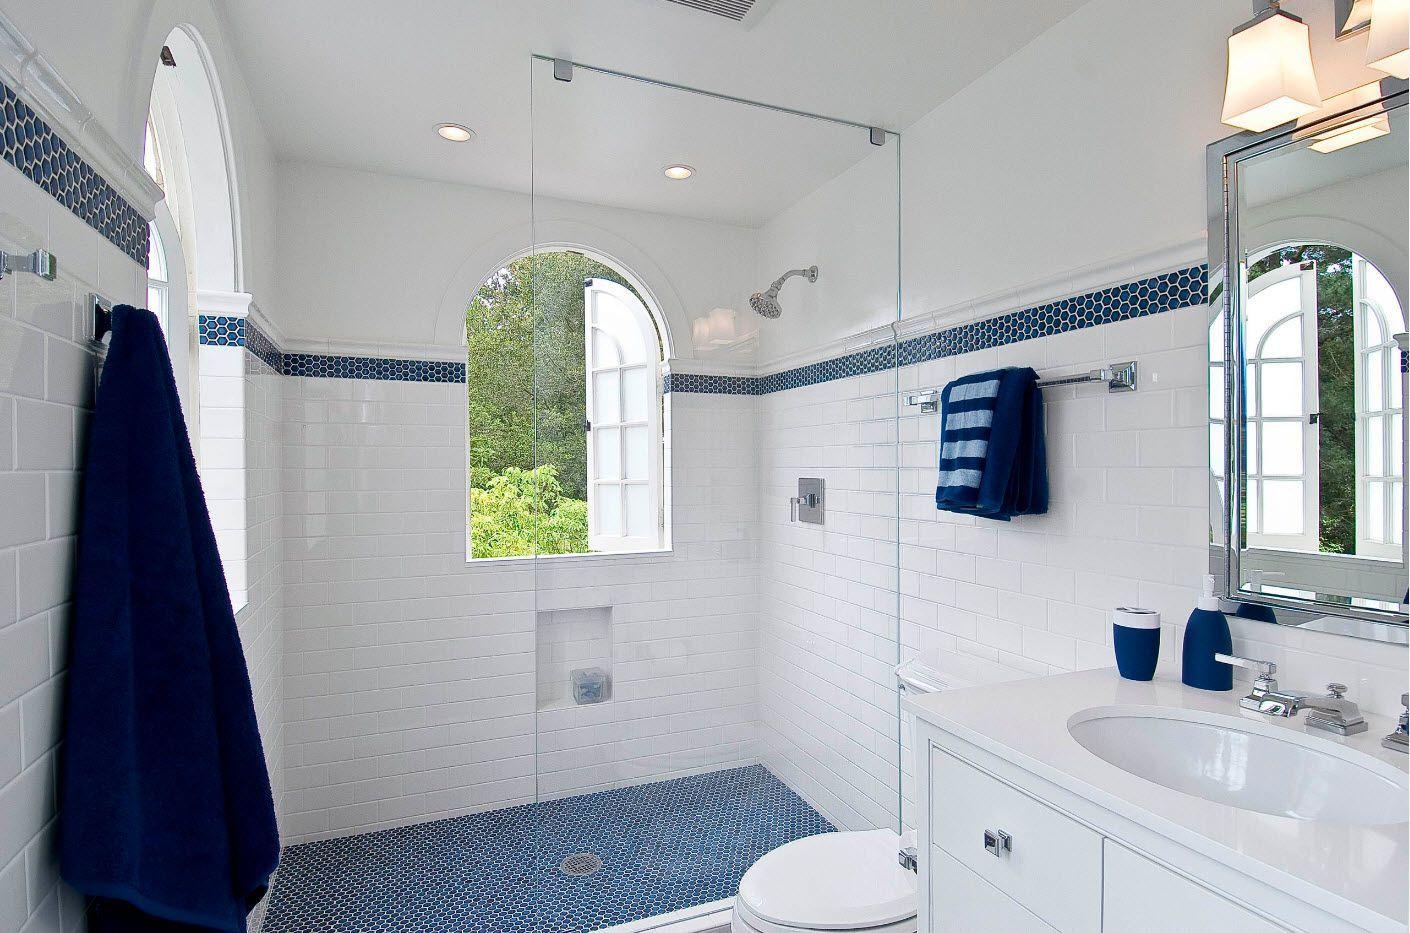 Shower zone with mirror